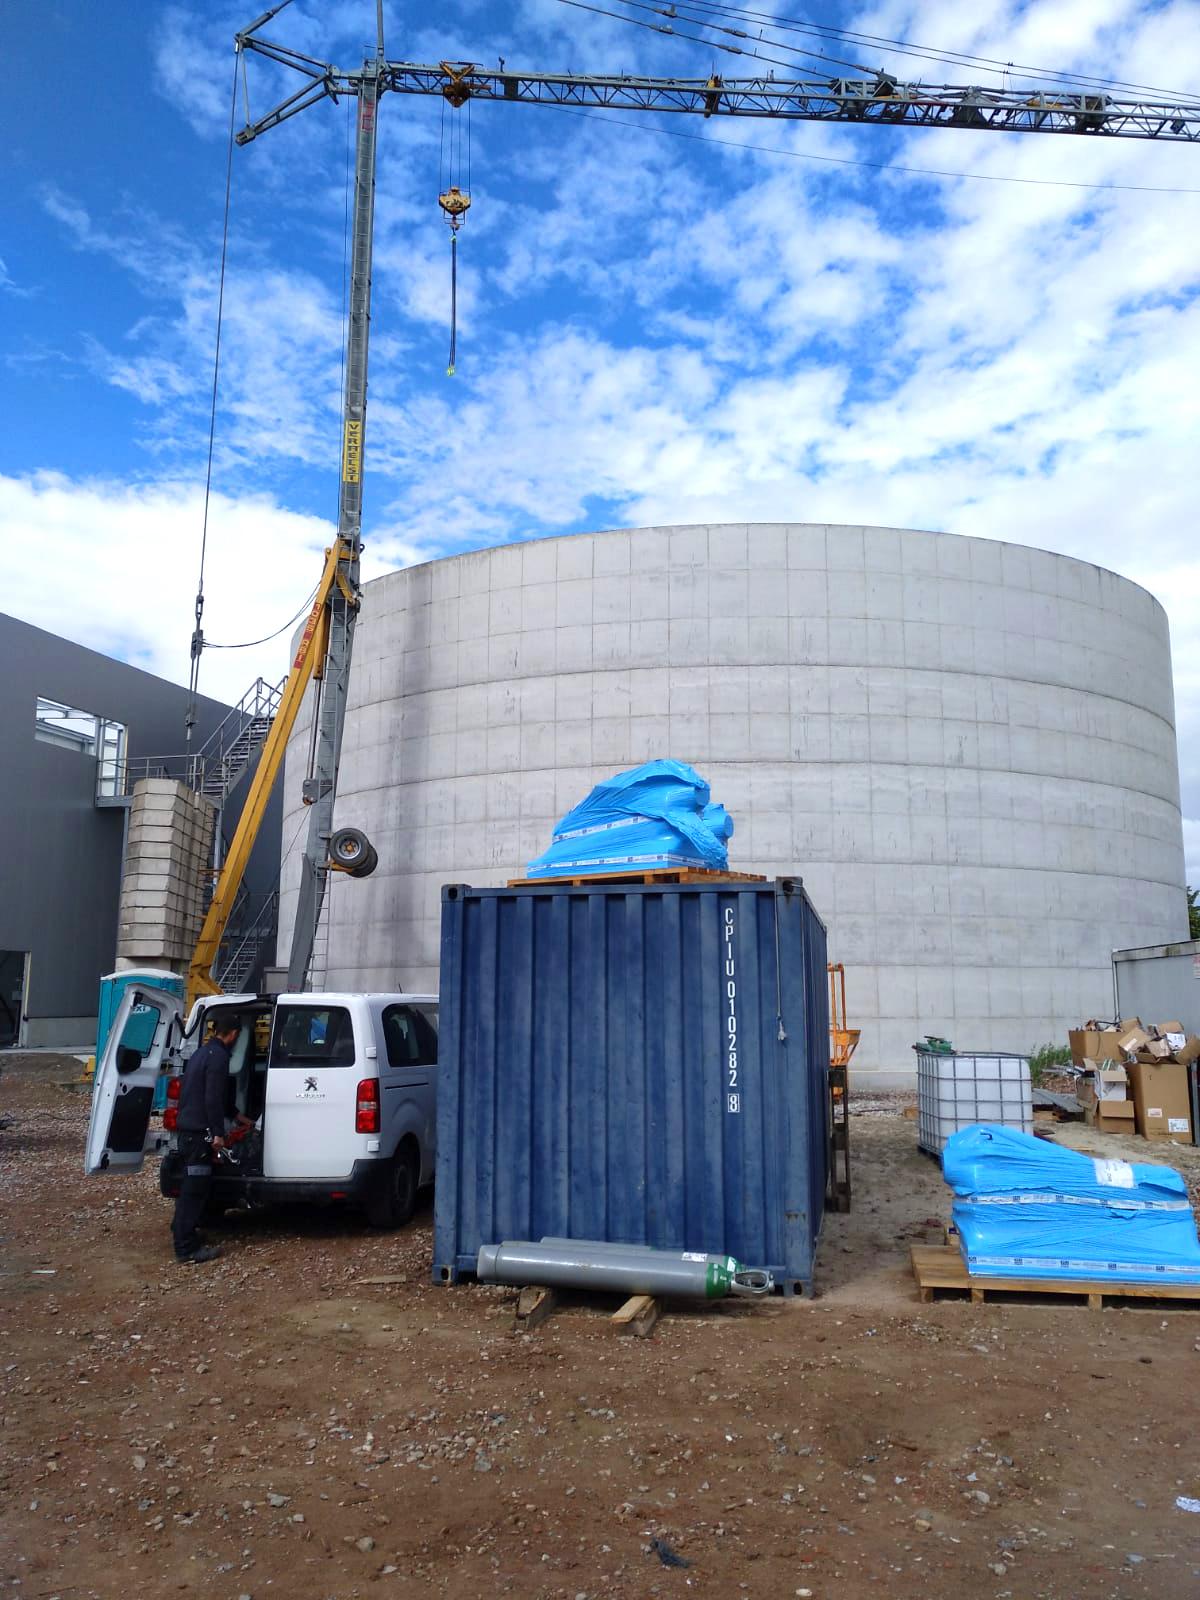 Mydibel Water Treatment INDEREN Tratamiento Aguas Mydibel INDEREN-Vista general reactor aerobio-01